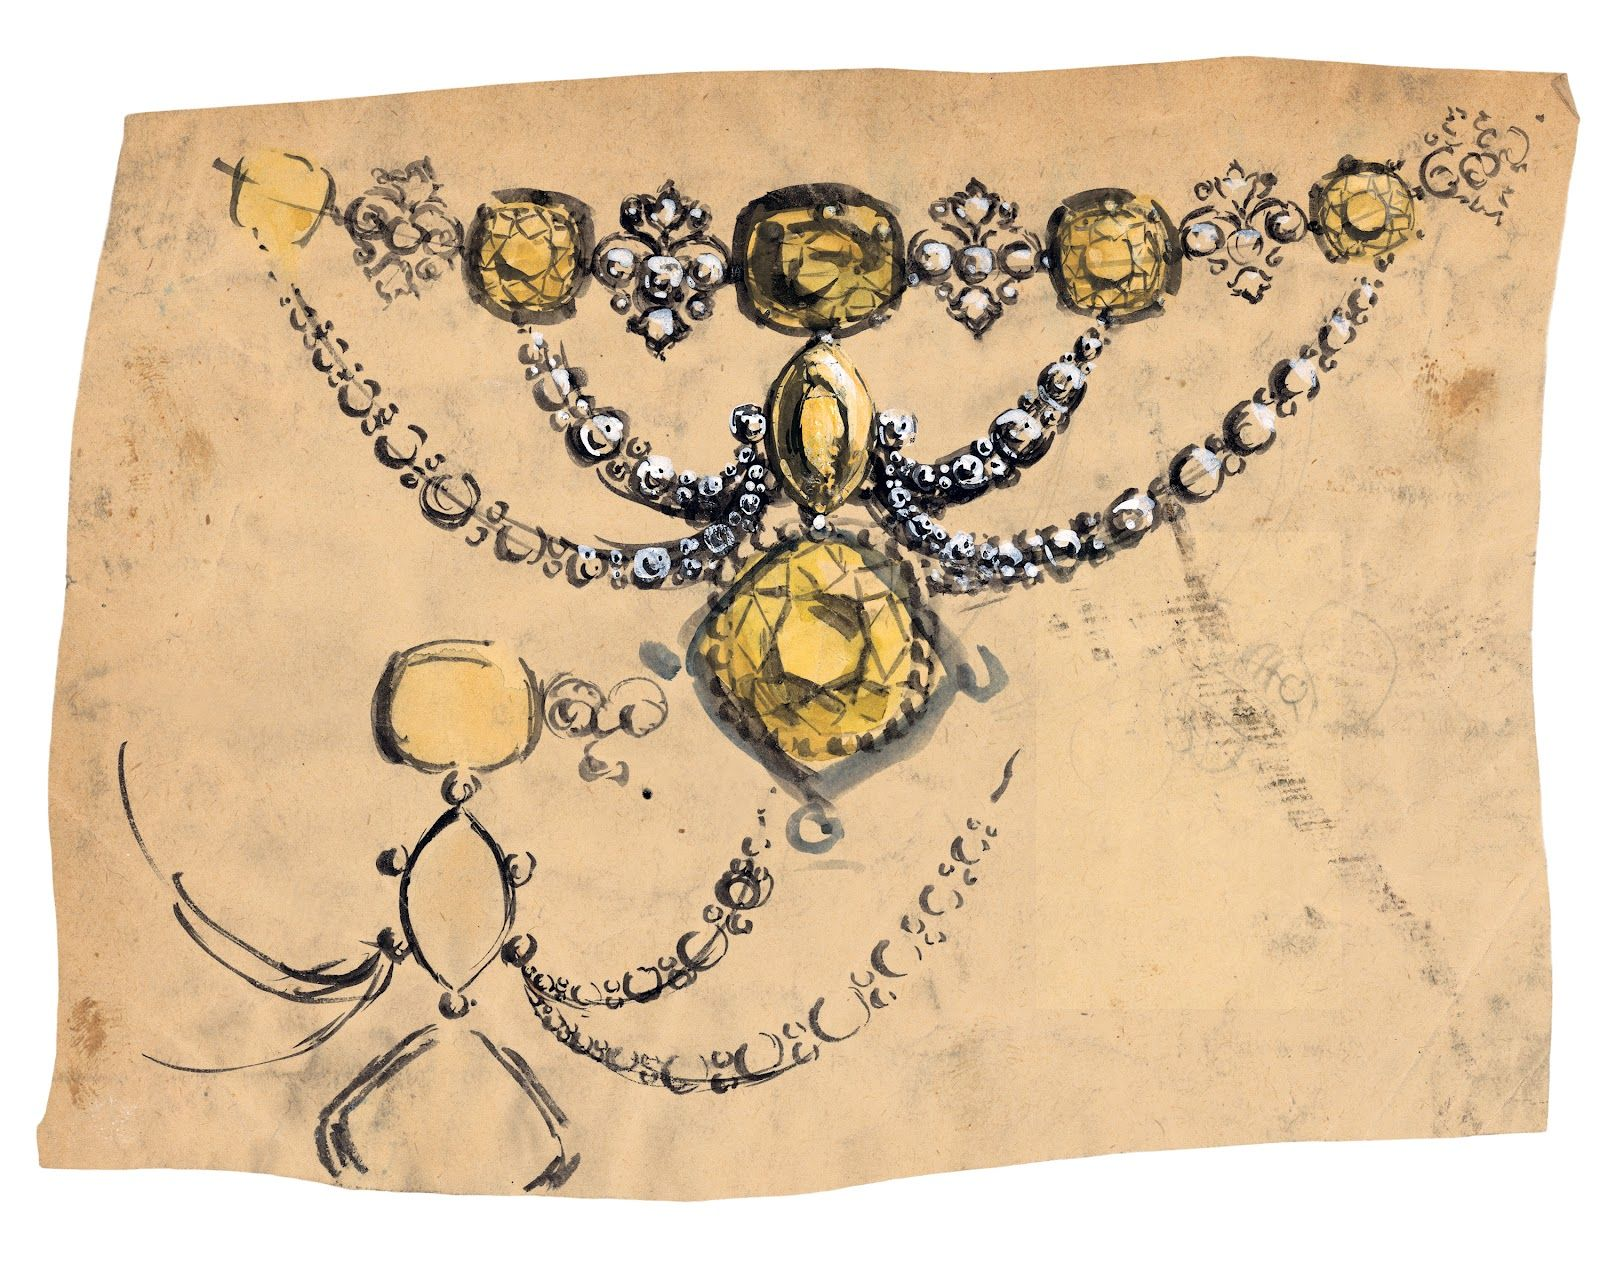 Tiffany Co Jewellery Illustrations - BritishBeautyBlogger